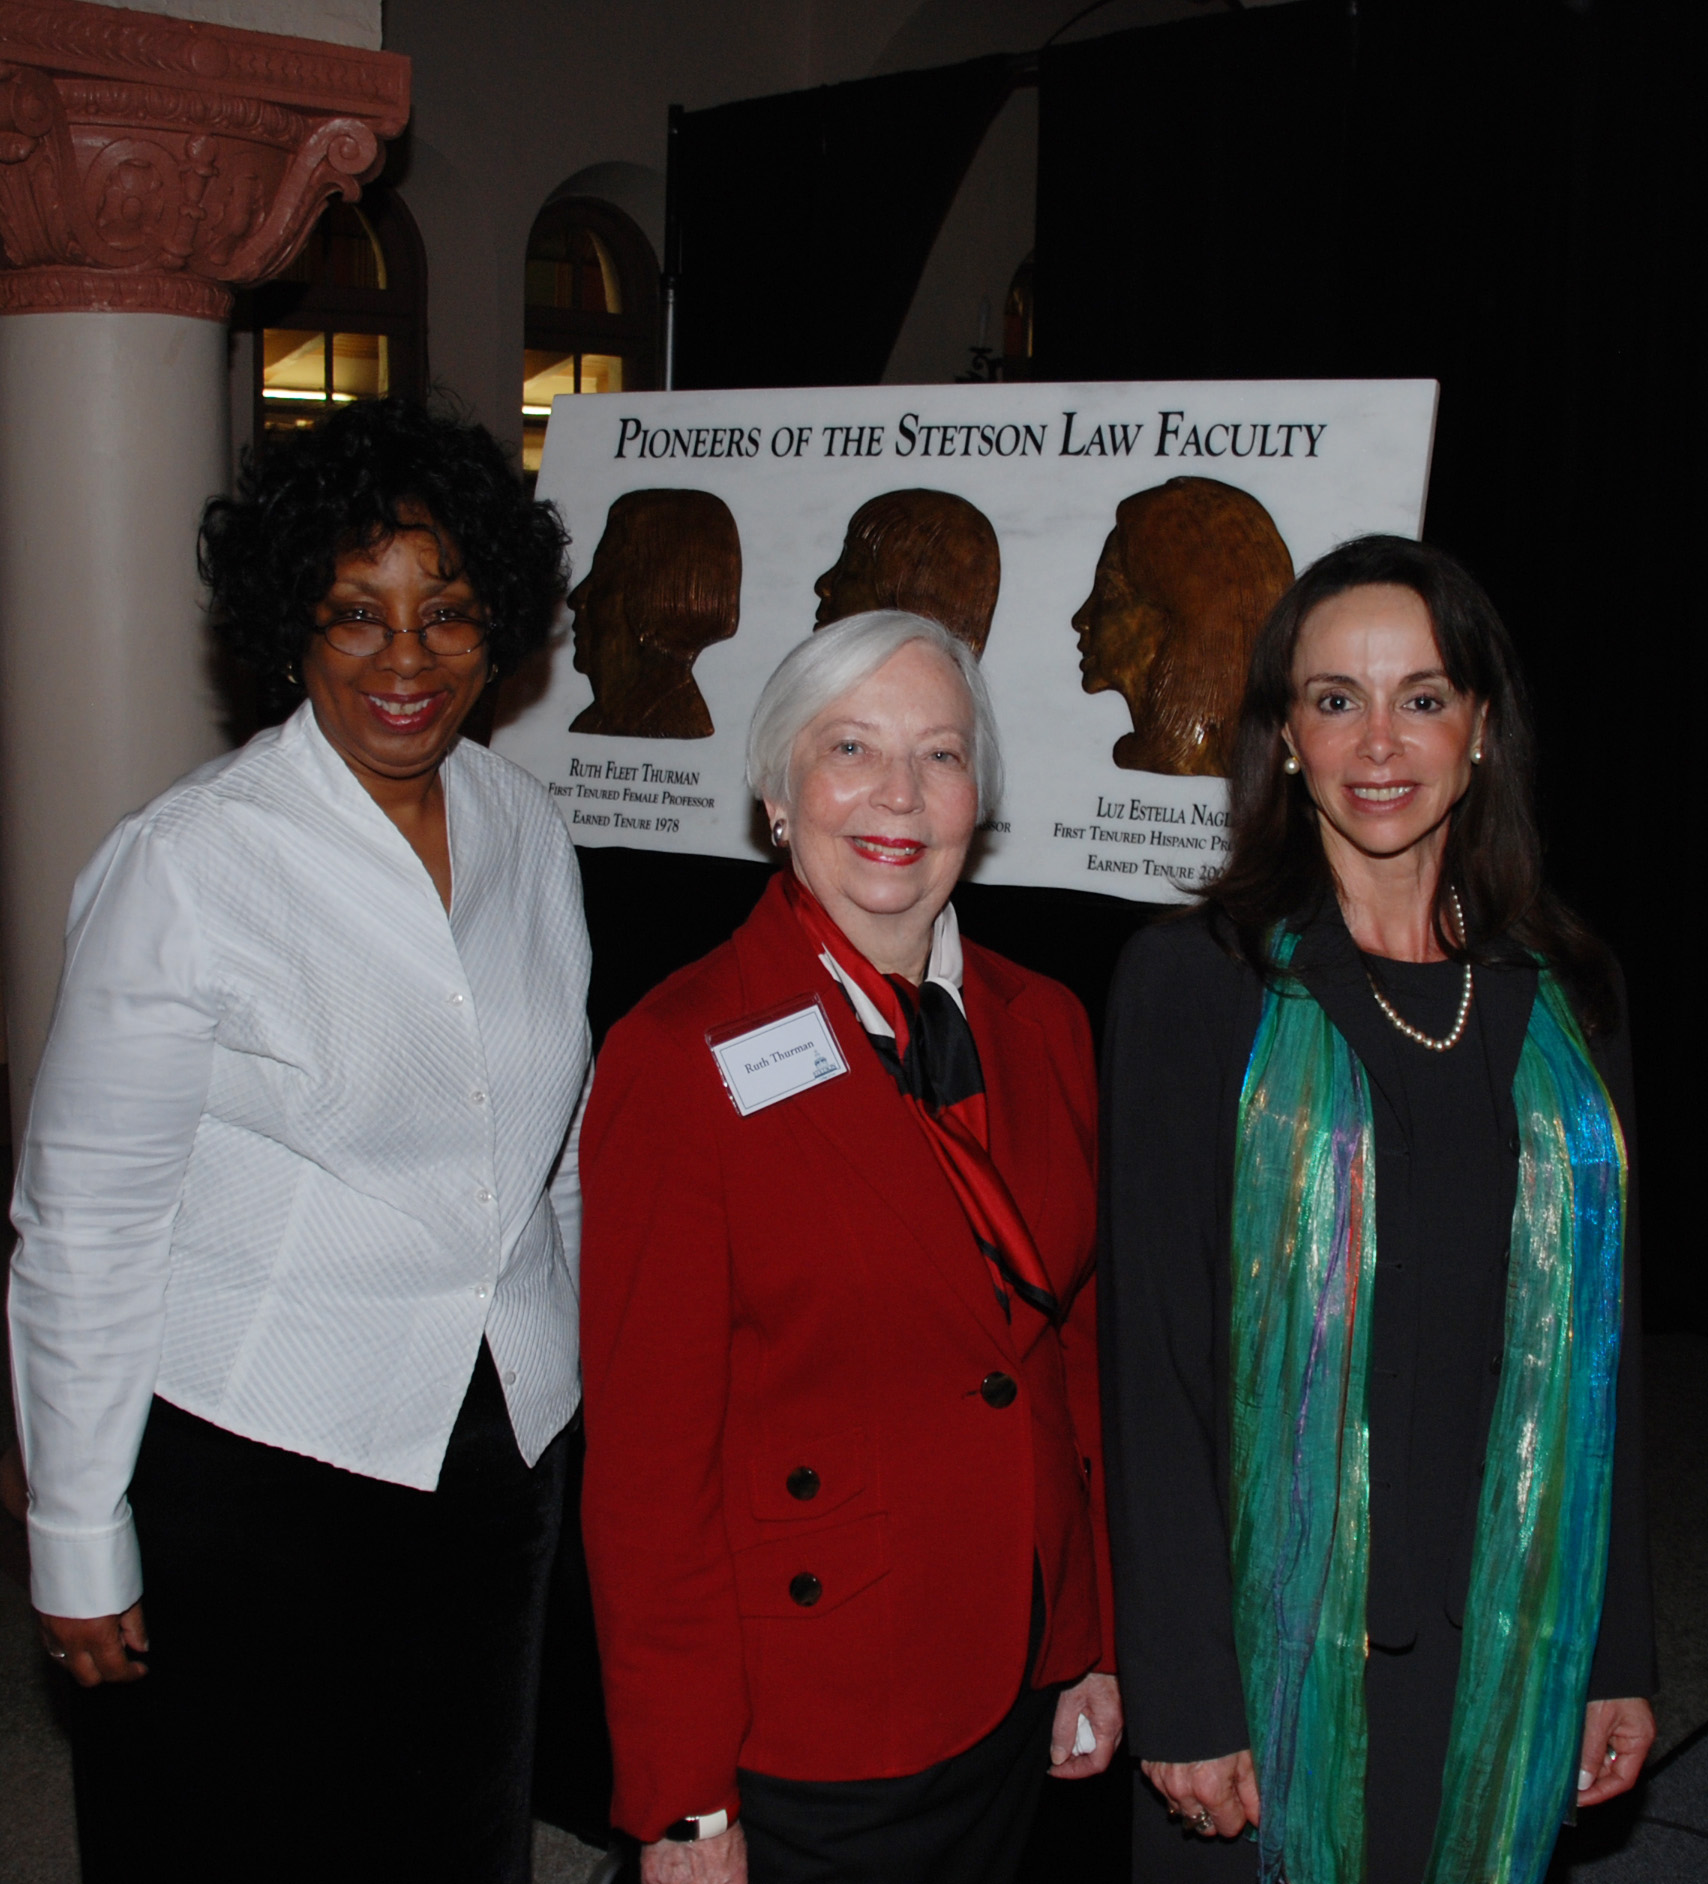 9c7cf59c (L-R): Stetson Law pioneering educators Professor Dorothea Beane, Ruth  Thurman, and